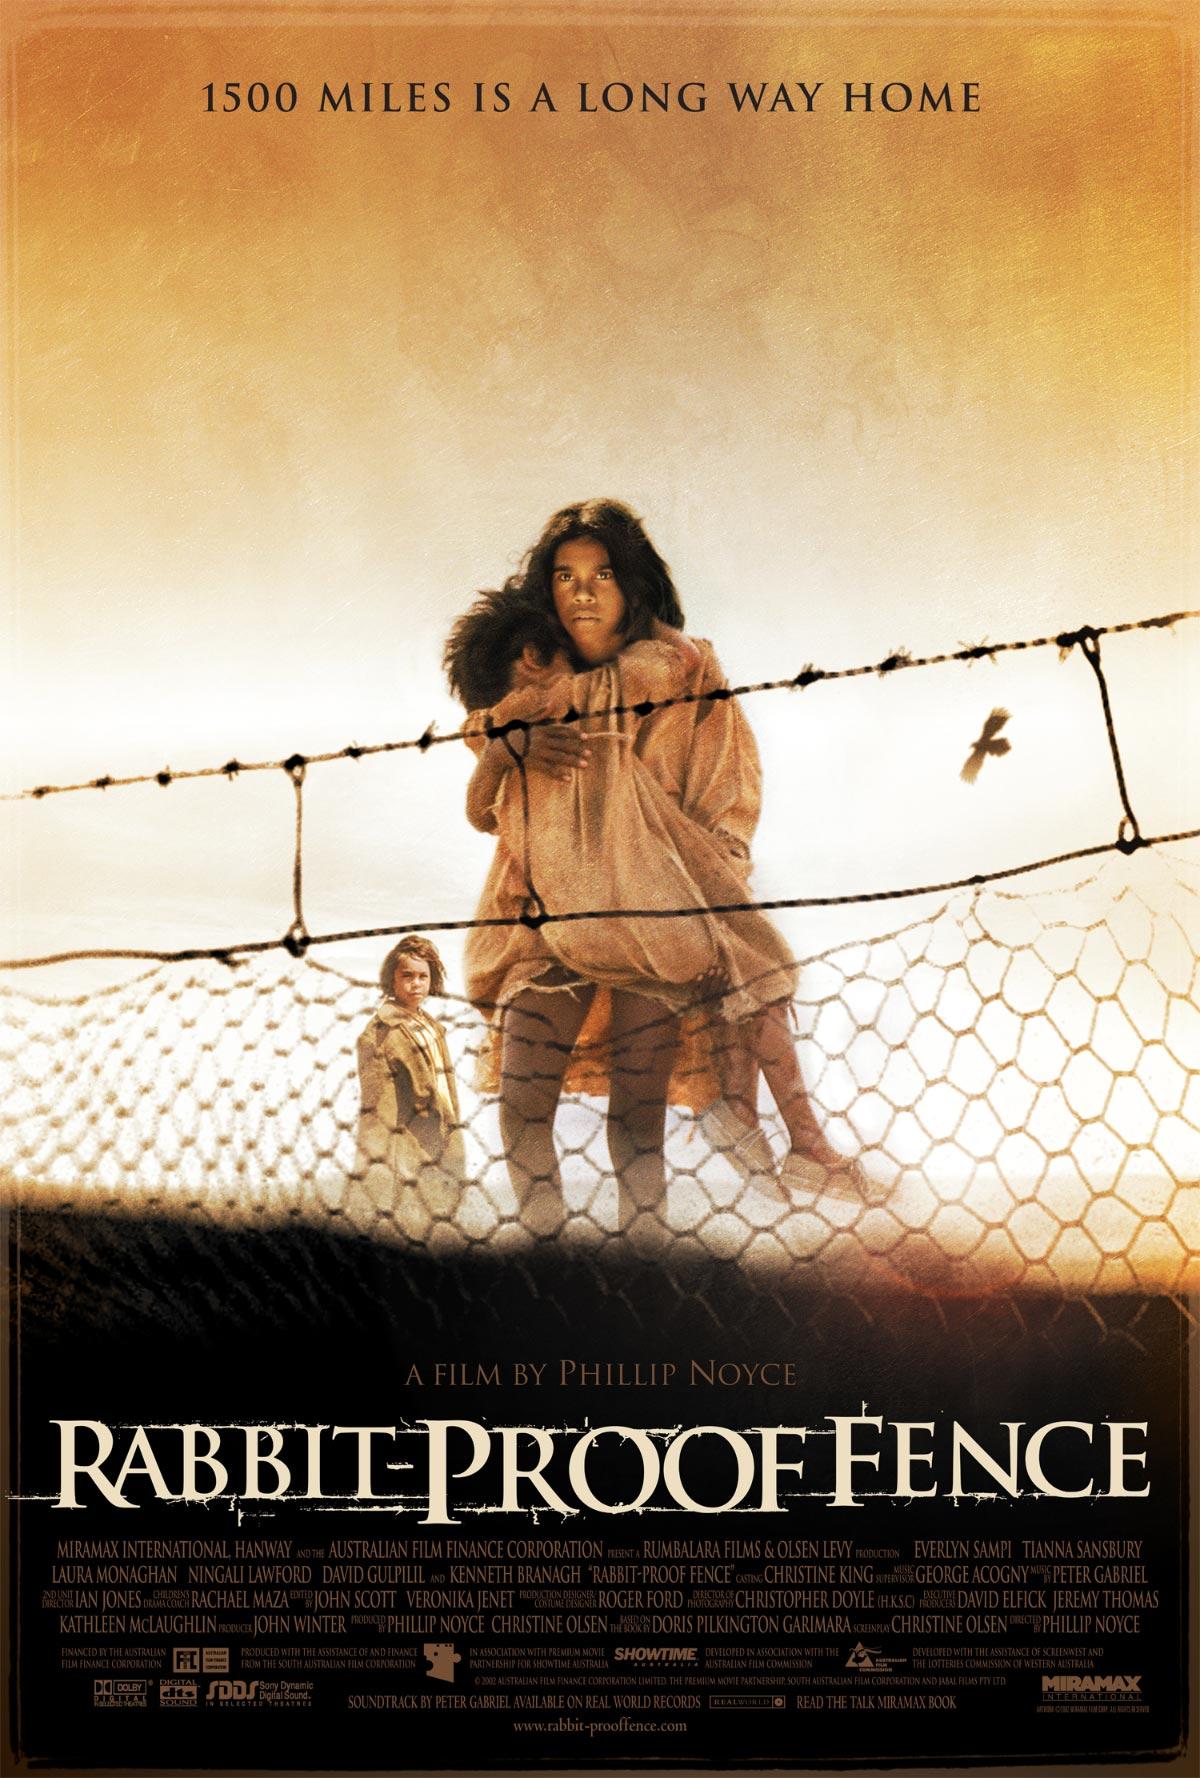 Rabbit-Proof Fence - Dreamogram